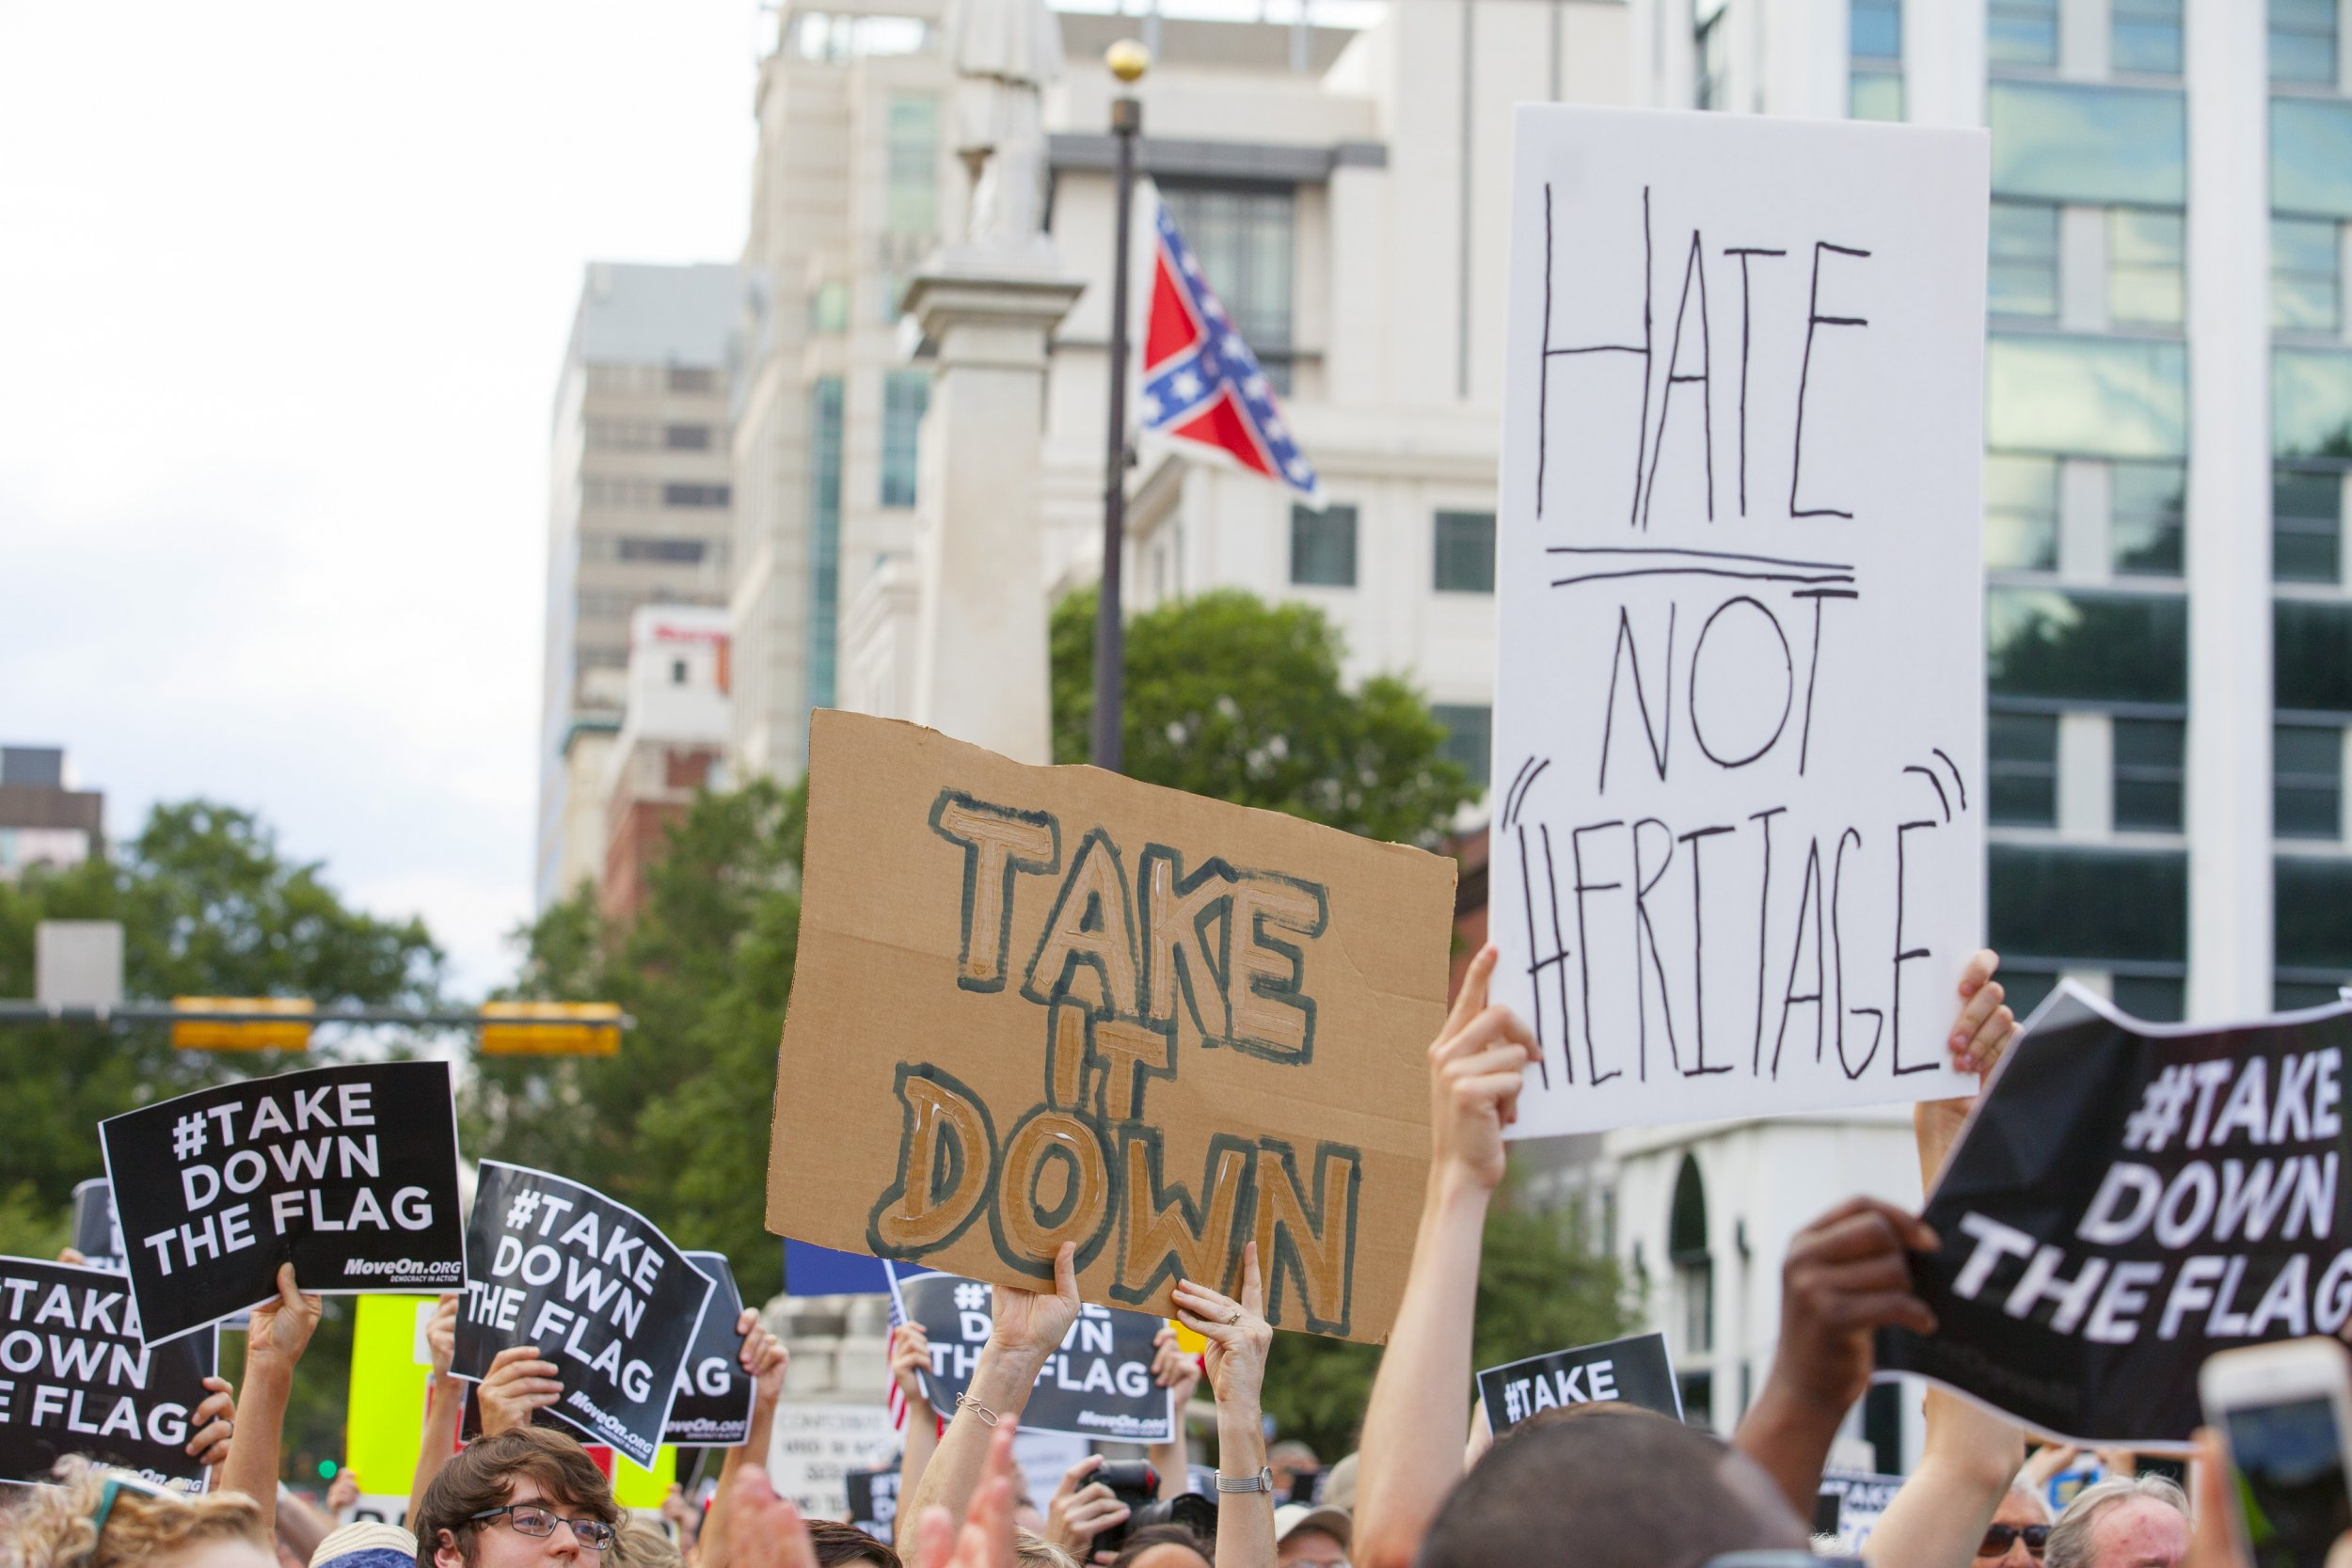 6-22-15 Confederate flag protest